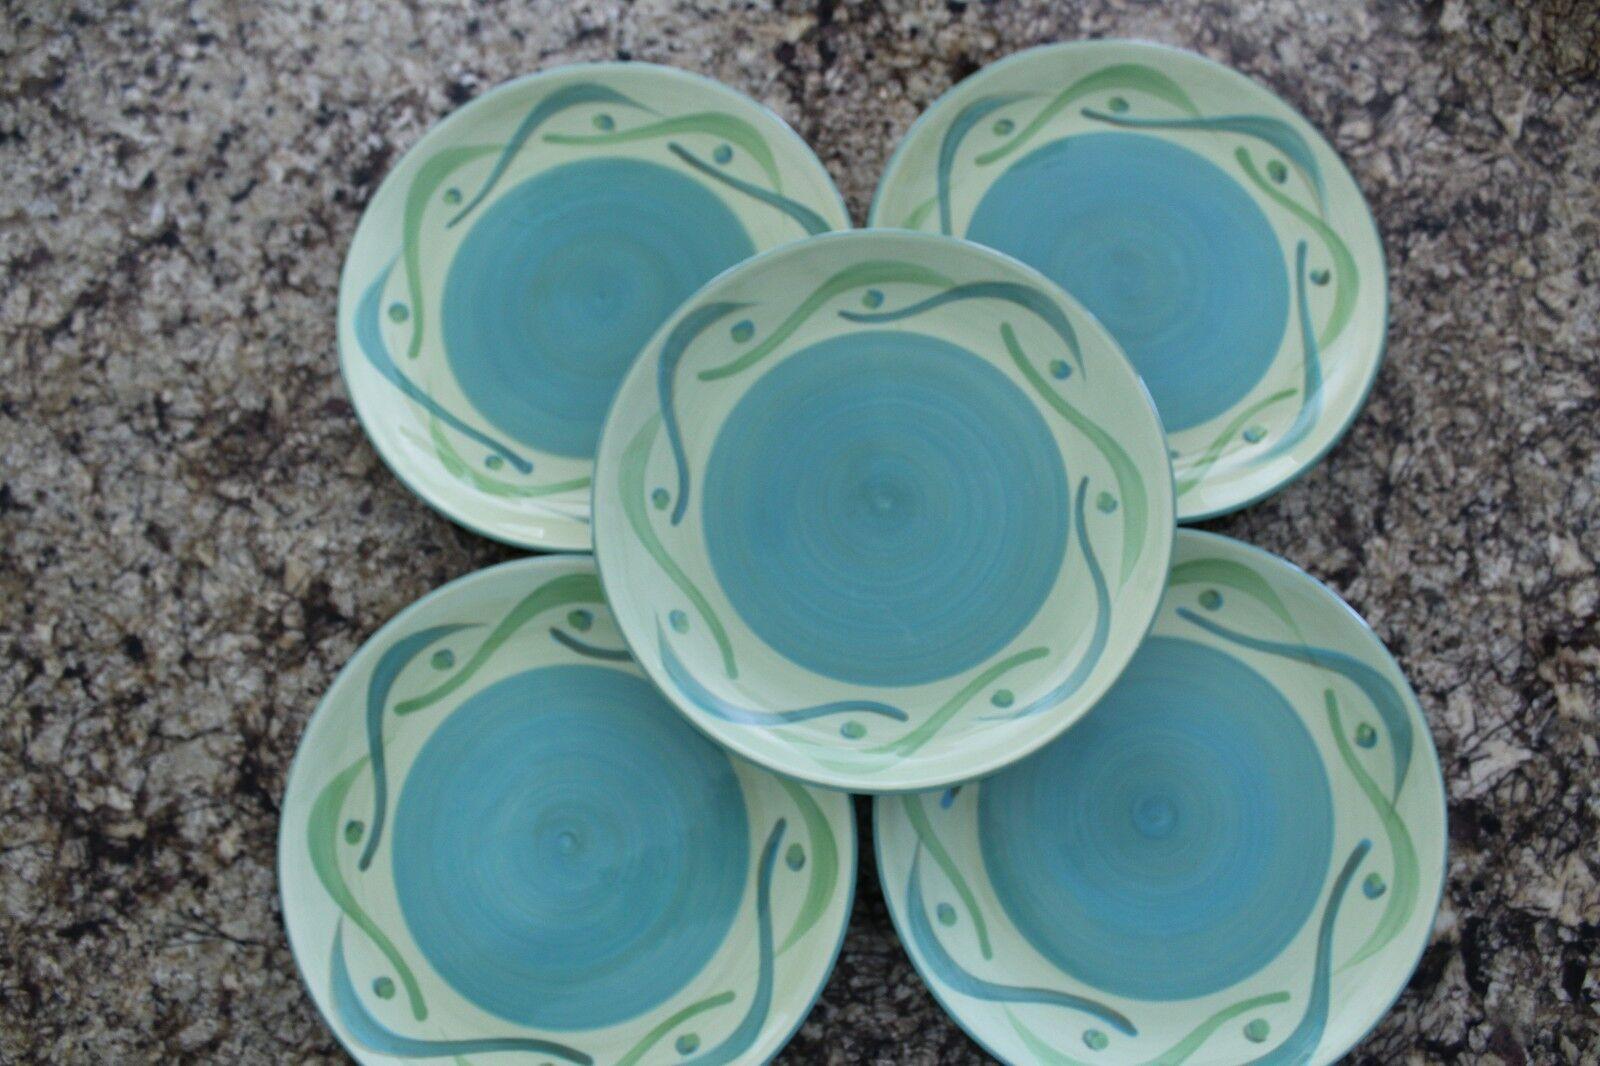 Southern Living at HOME 5 Provence Swirly Salad Plates Gail Pittman Aqua Green